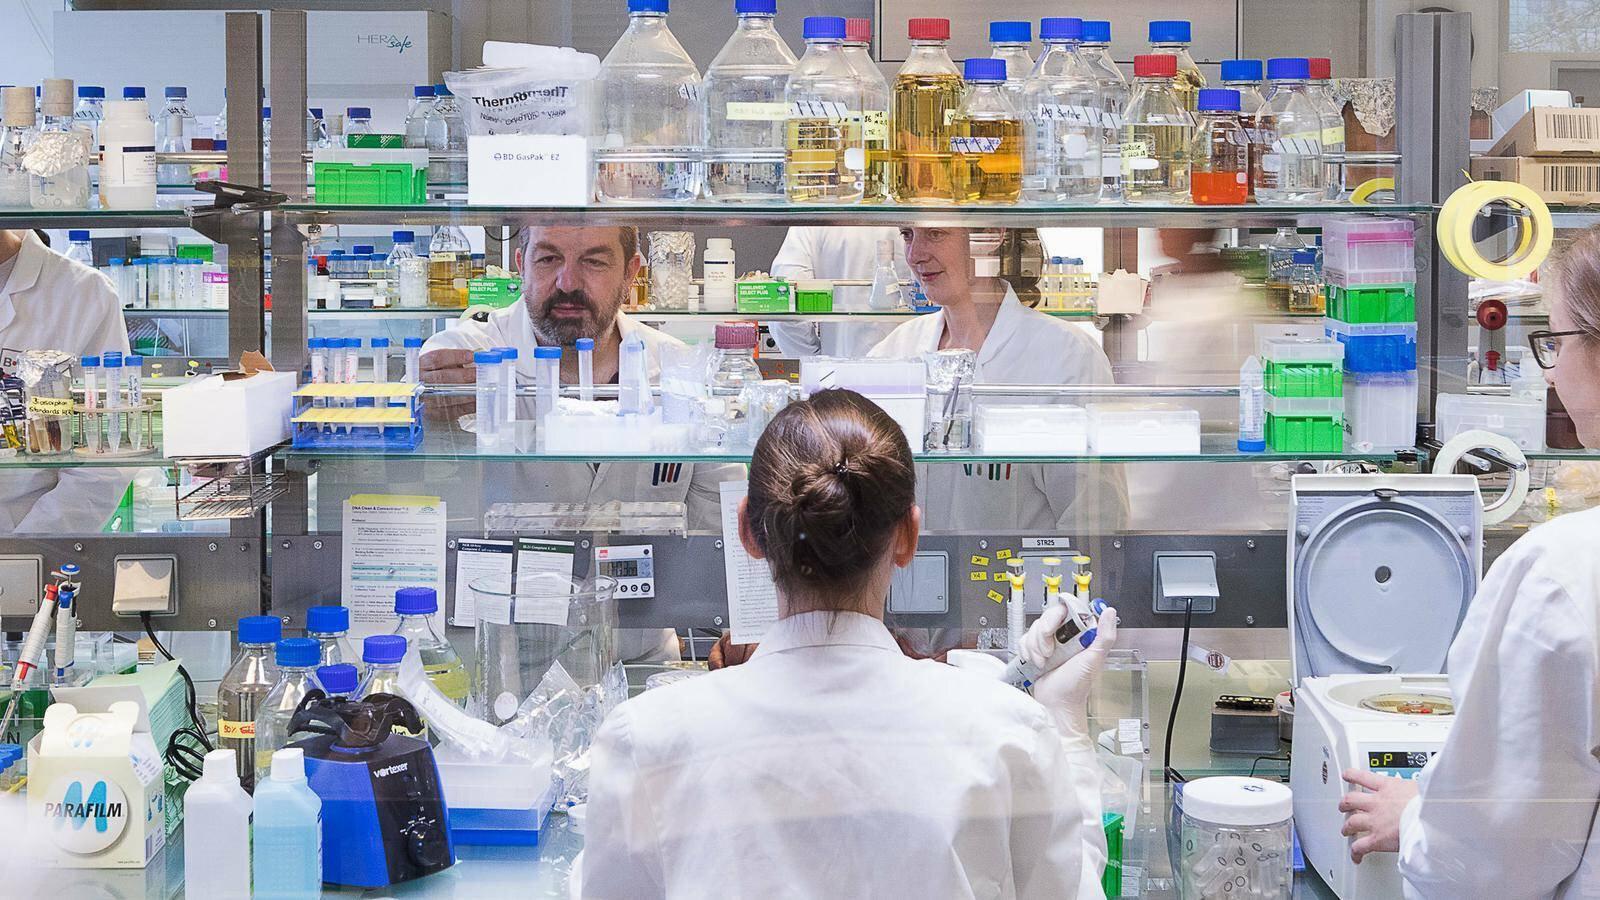 Gallery image 1 - BRAIN Molecular Biology Laboratory